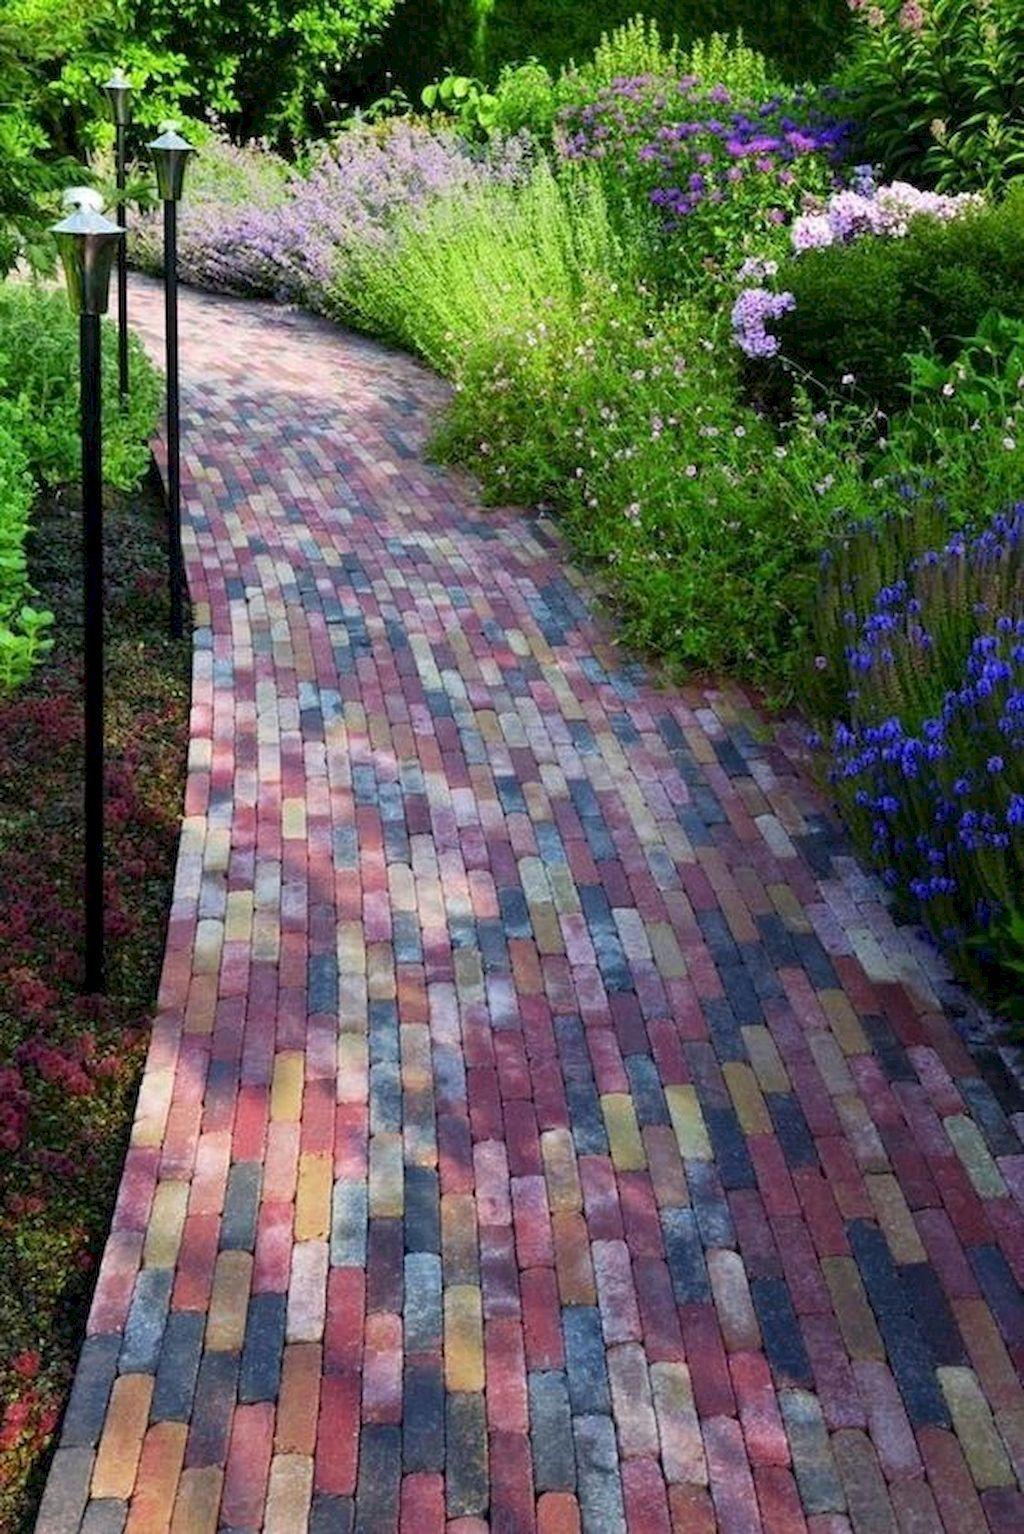 Photo of 50 Stunning DIY Garden Path and Walkways Design Ideas